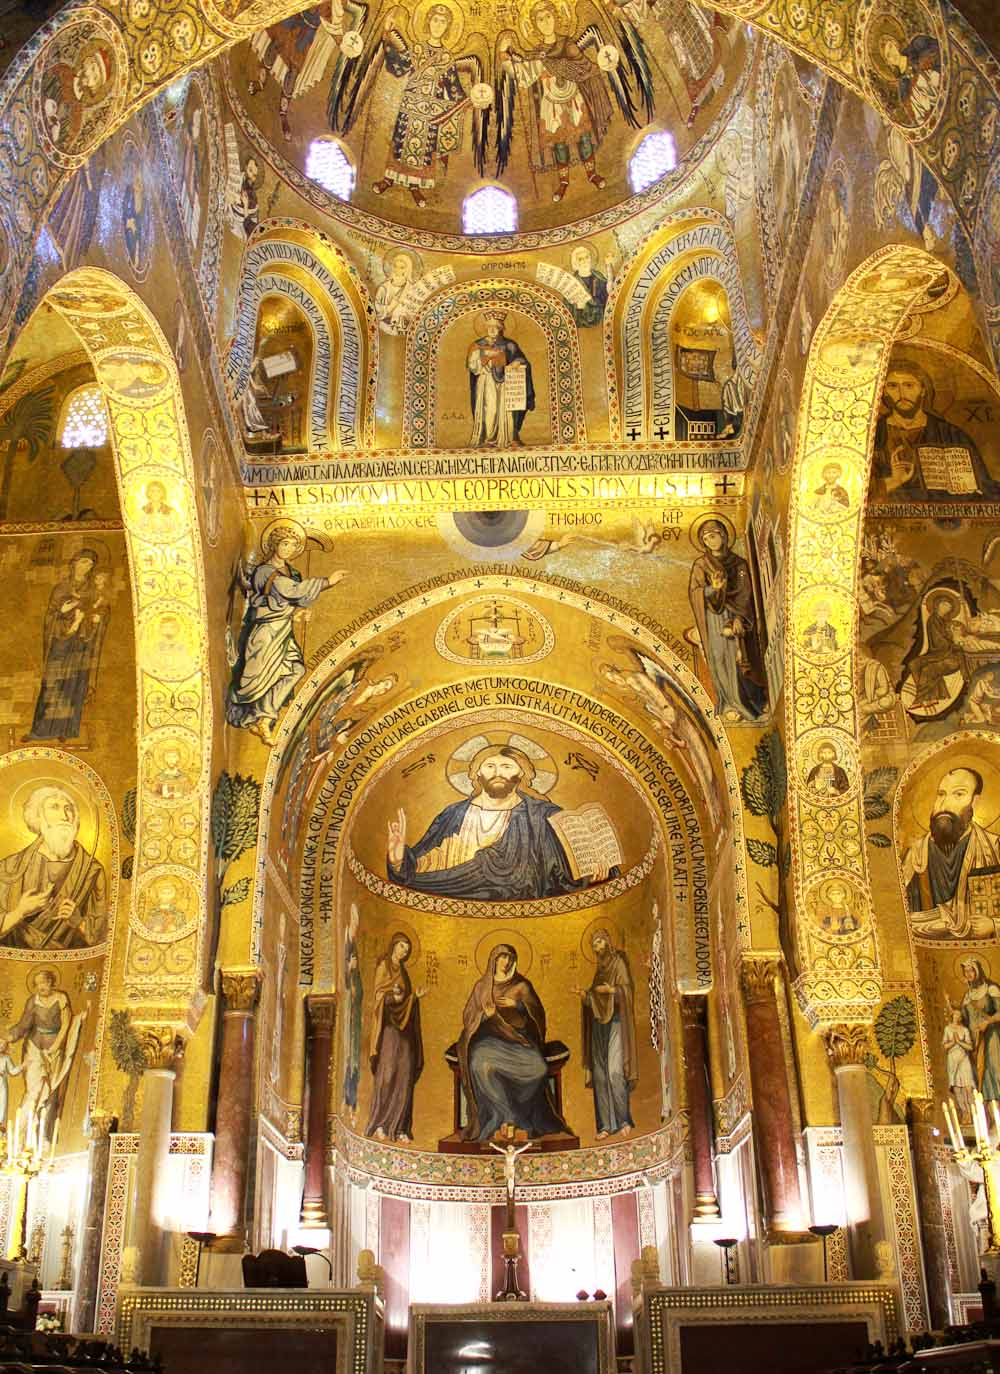 Cappella Palatina in Palermo - Italian Notes